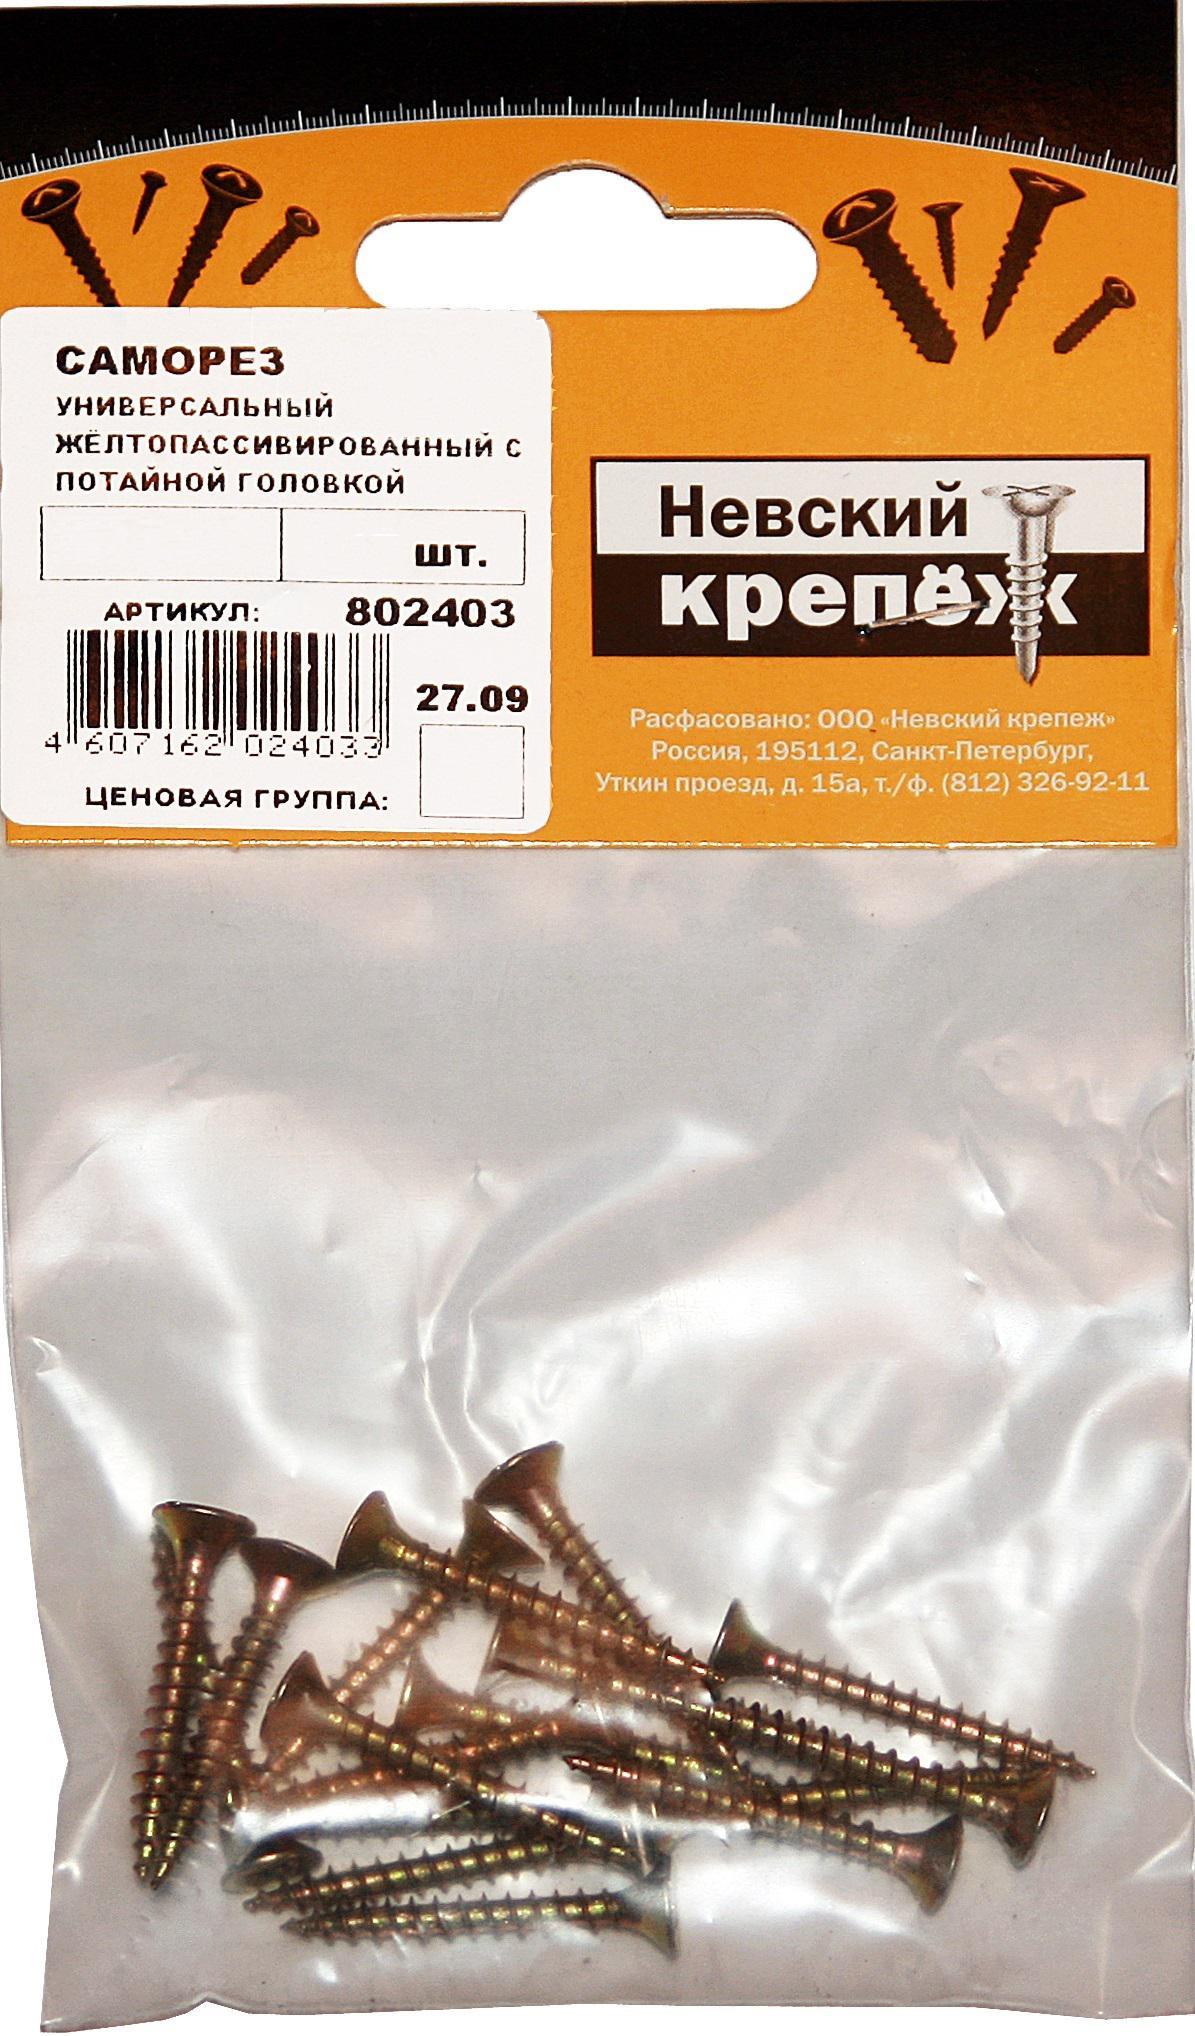 Саморез НЕВСКИЙ КРЕПЕЖ 802391